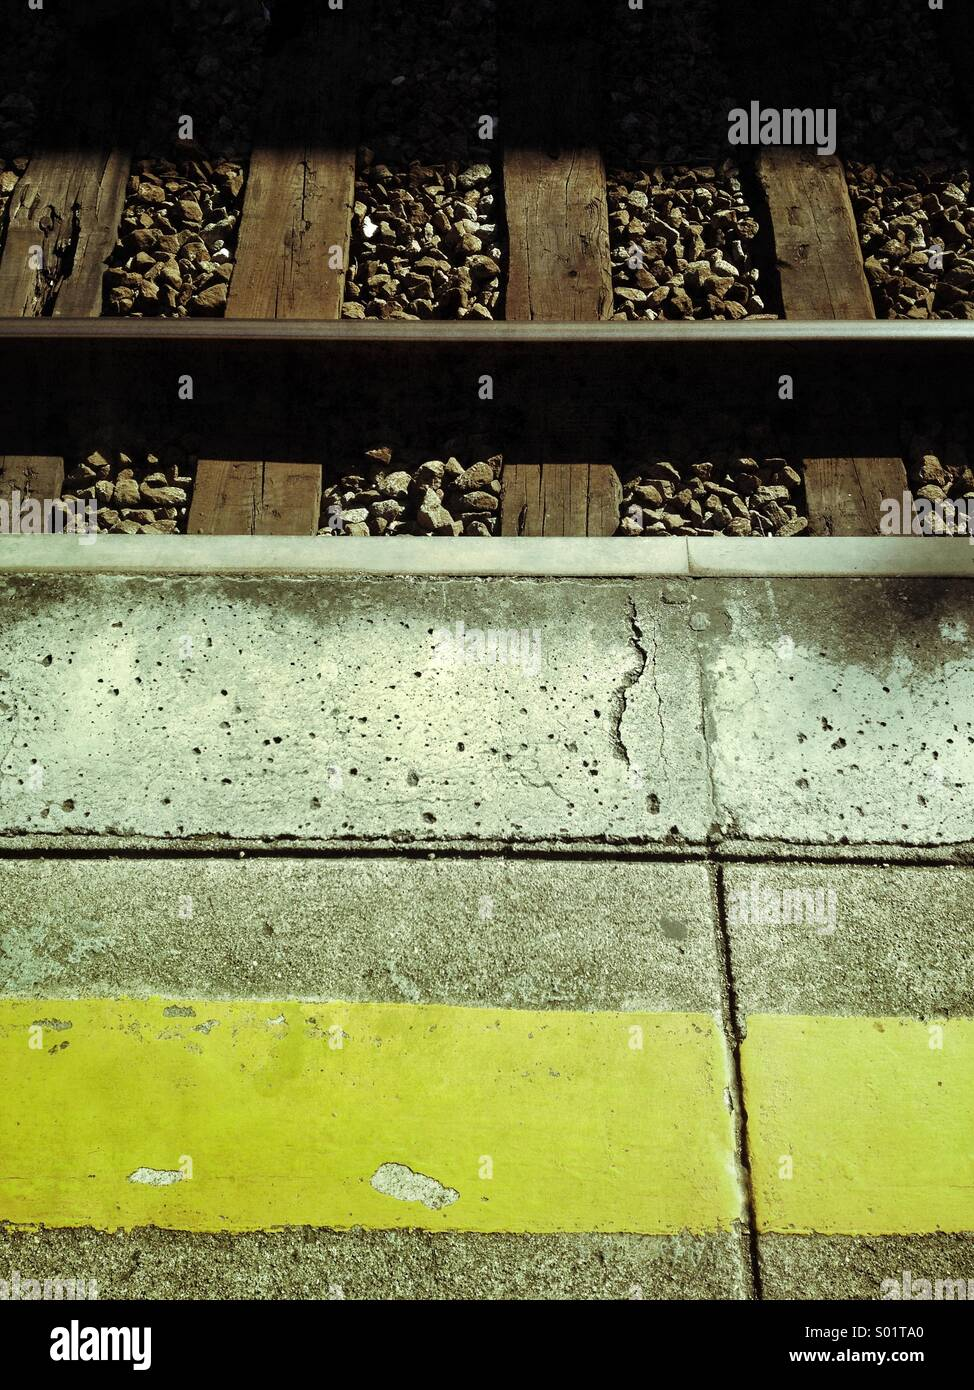 Waiting train, train platform - Stock Image